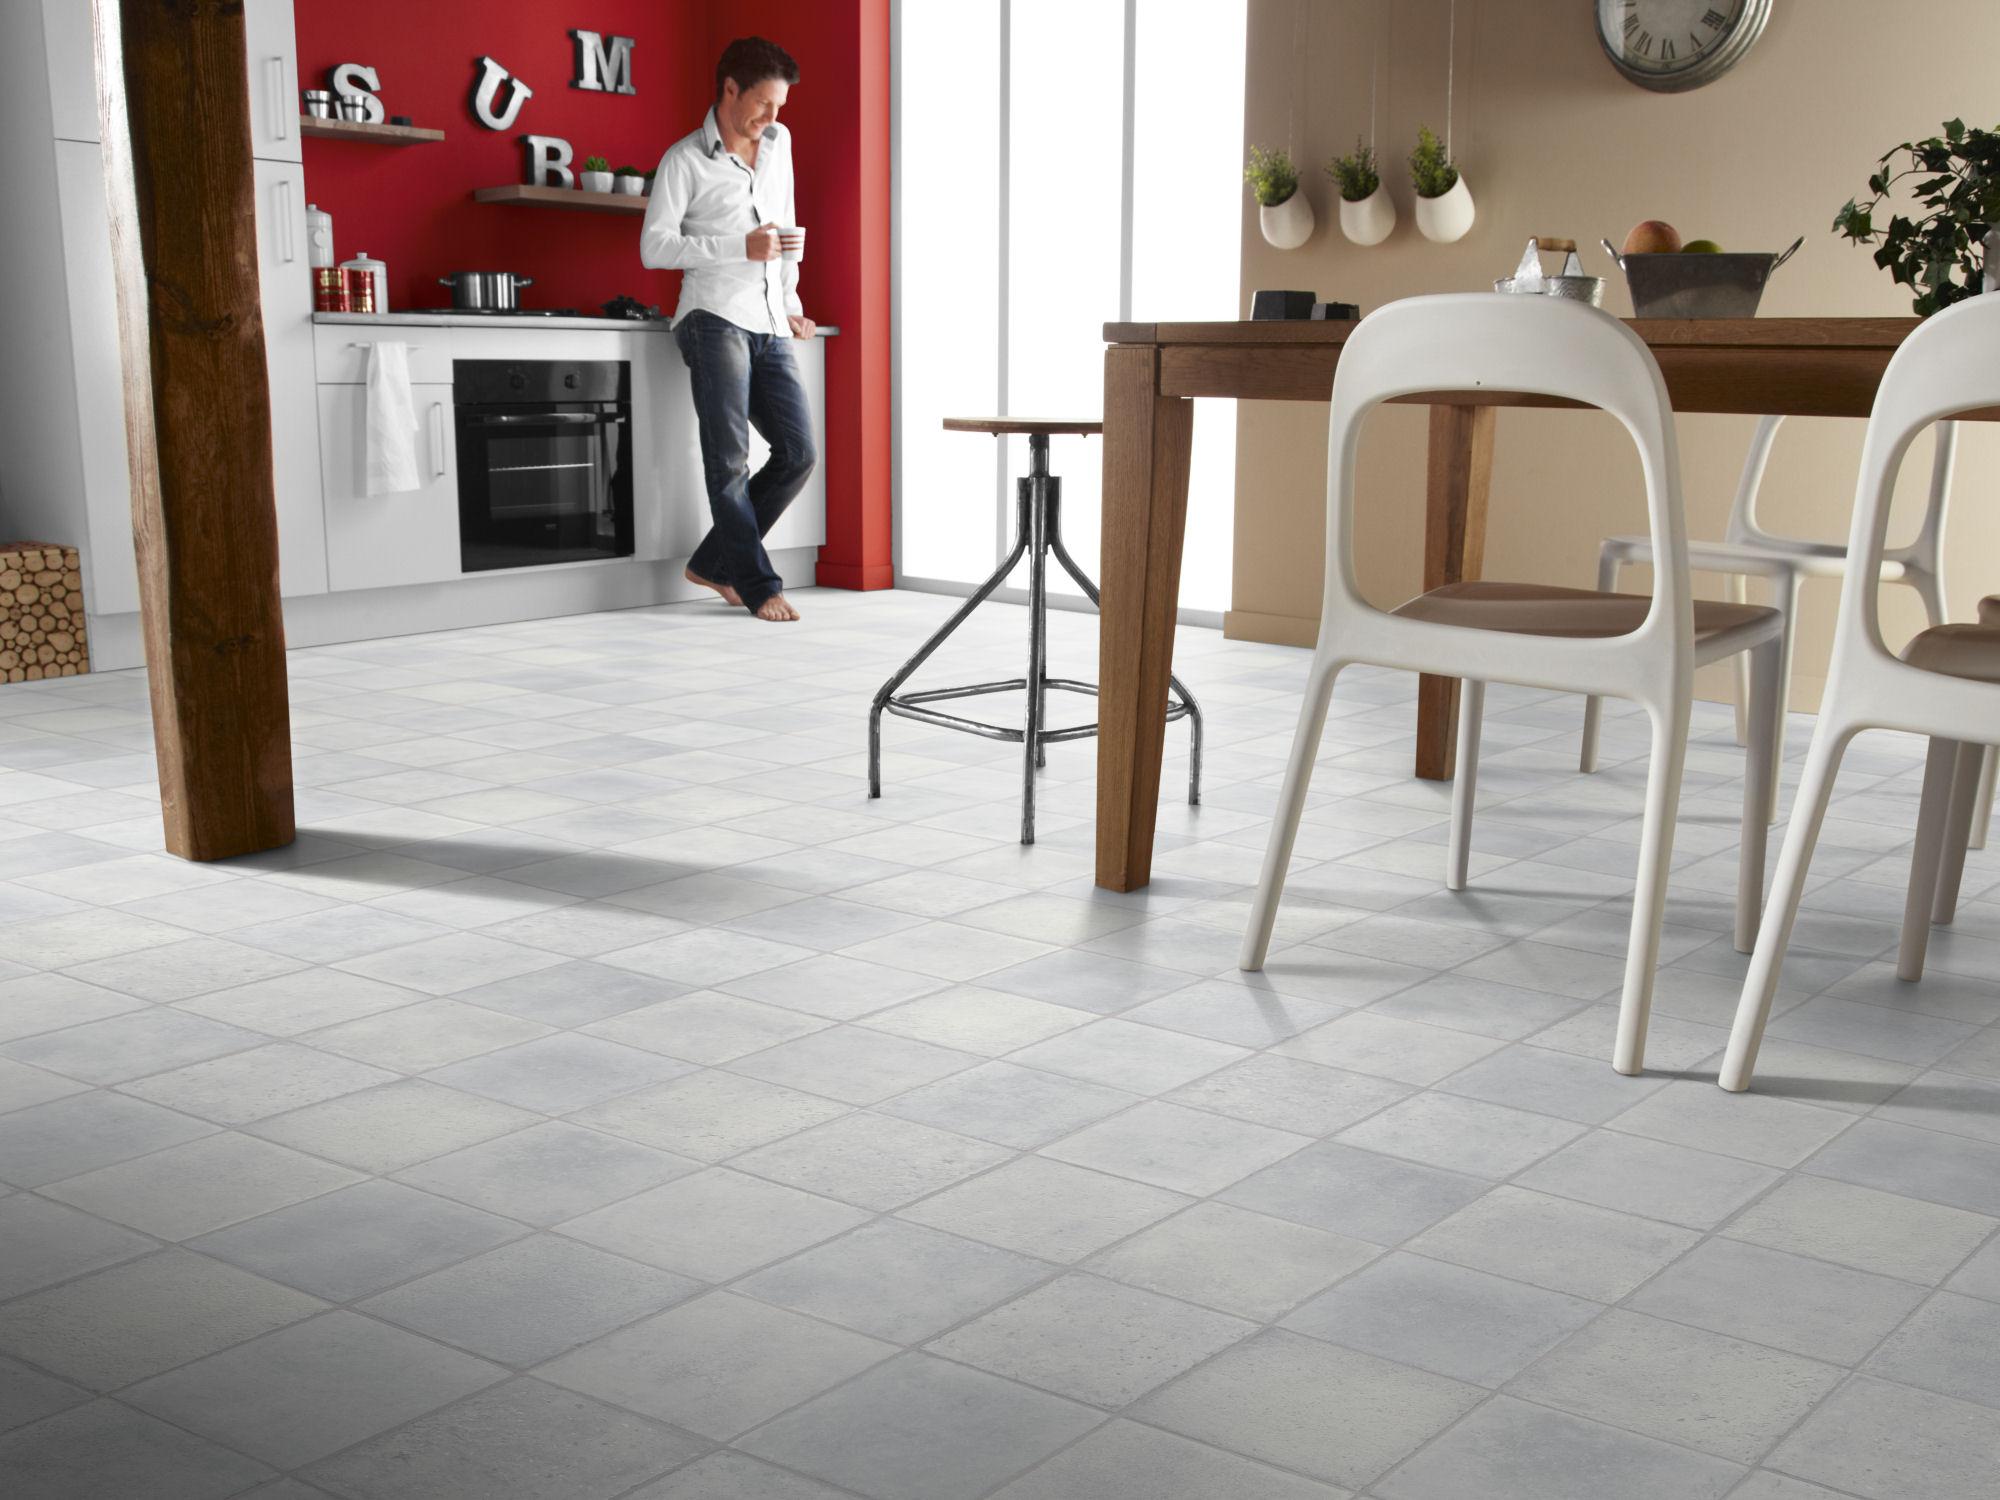 Kitchen Decorated with Vinyl Floor